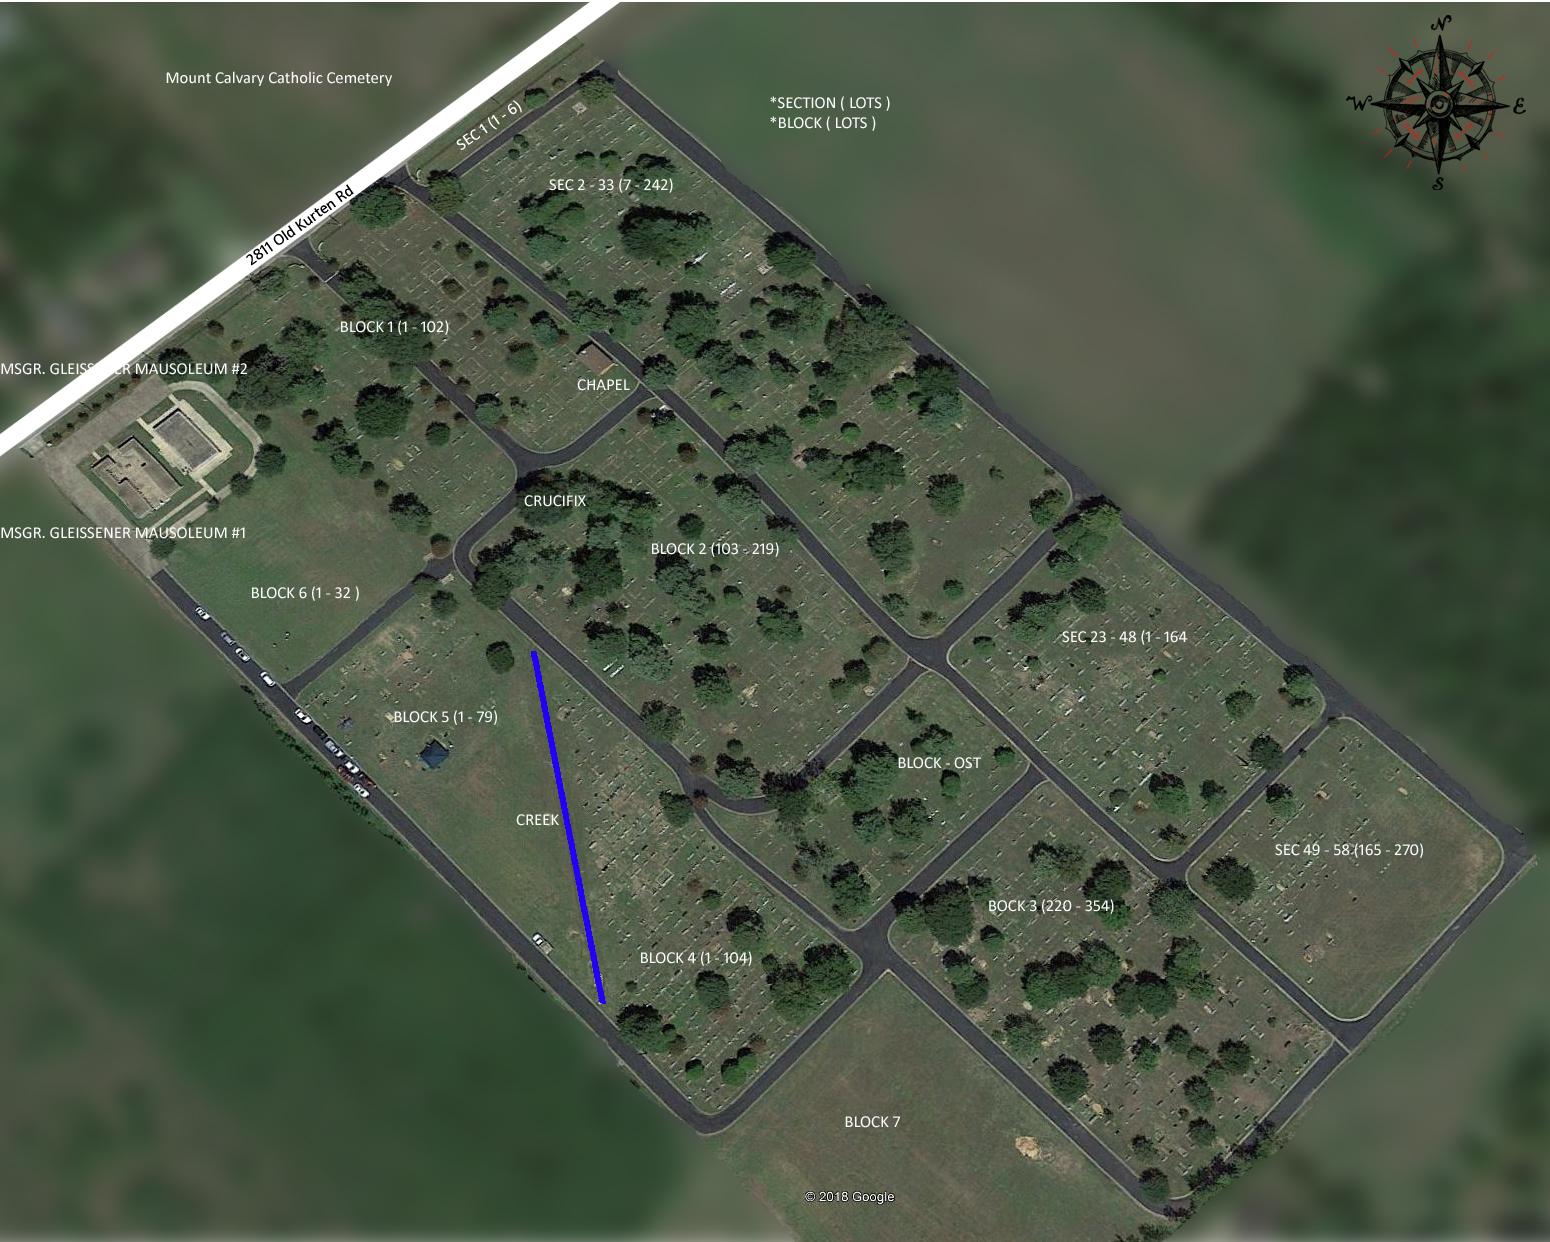 Mount Calvary Cemetery Layout